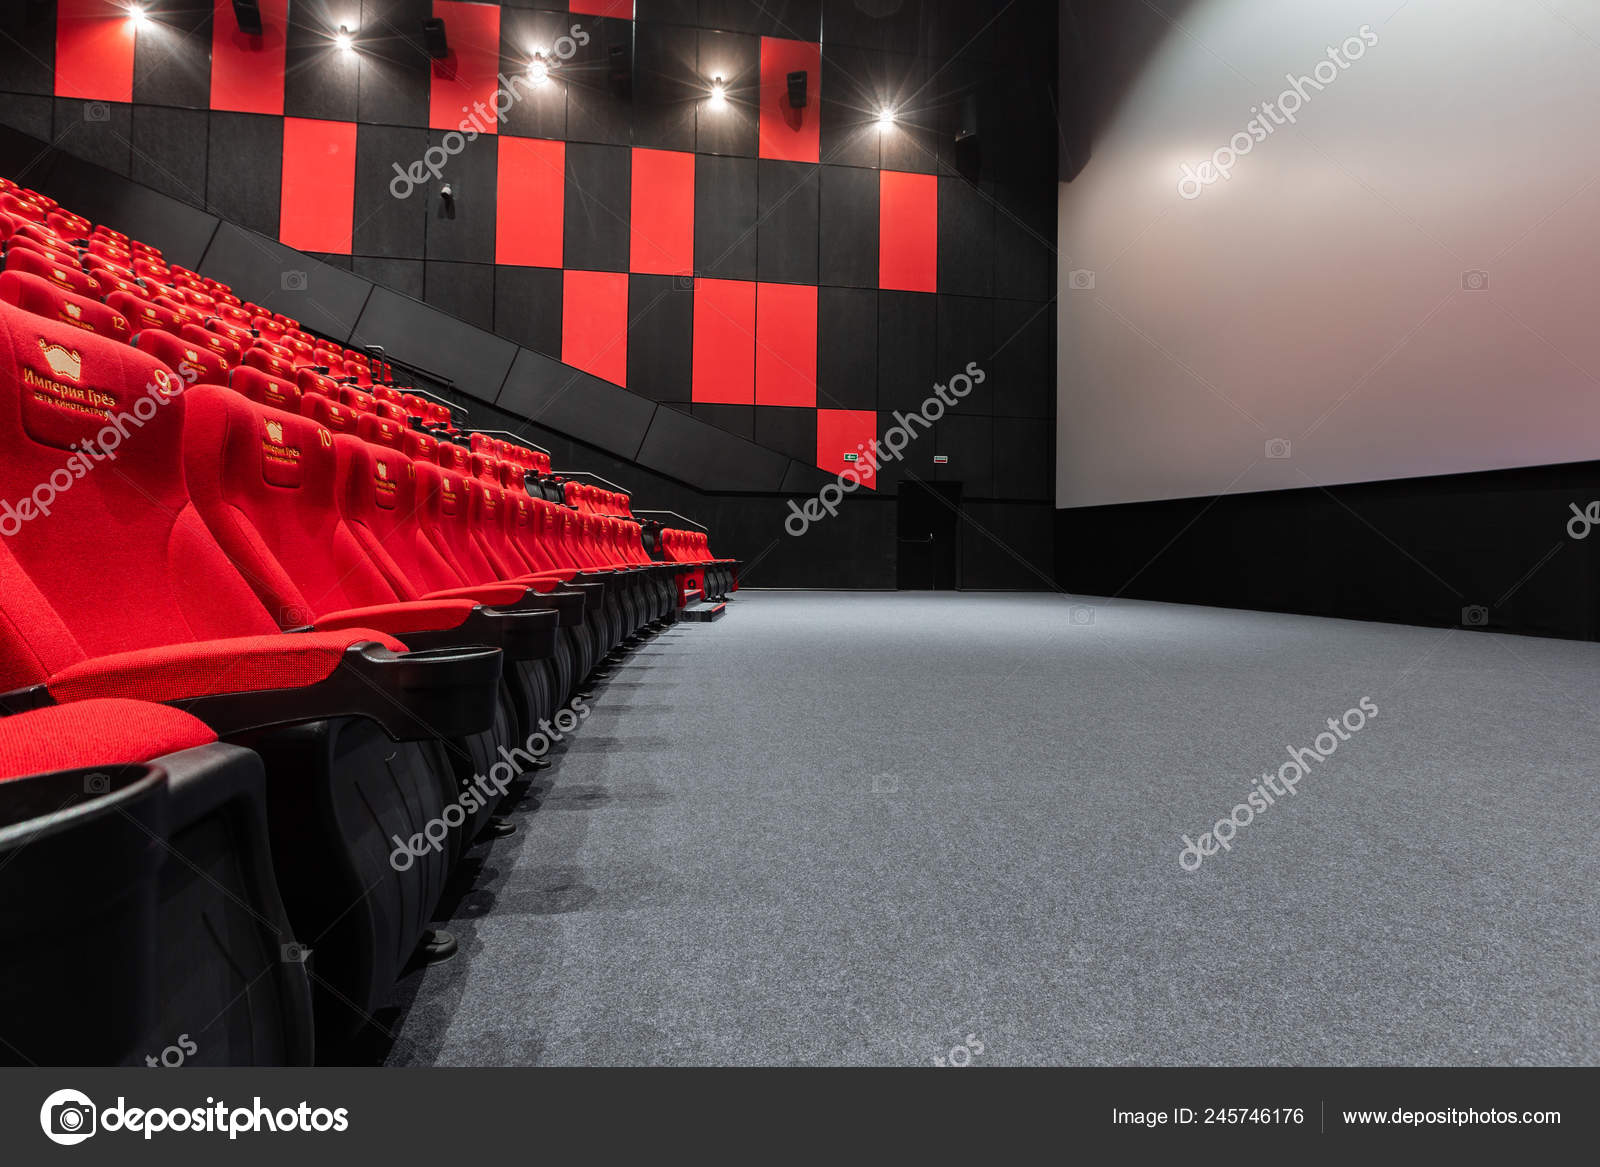 Russia, Nizhny Novgorod - November 14, 2016: Cinema Imperia